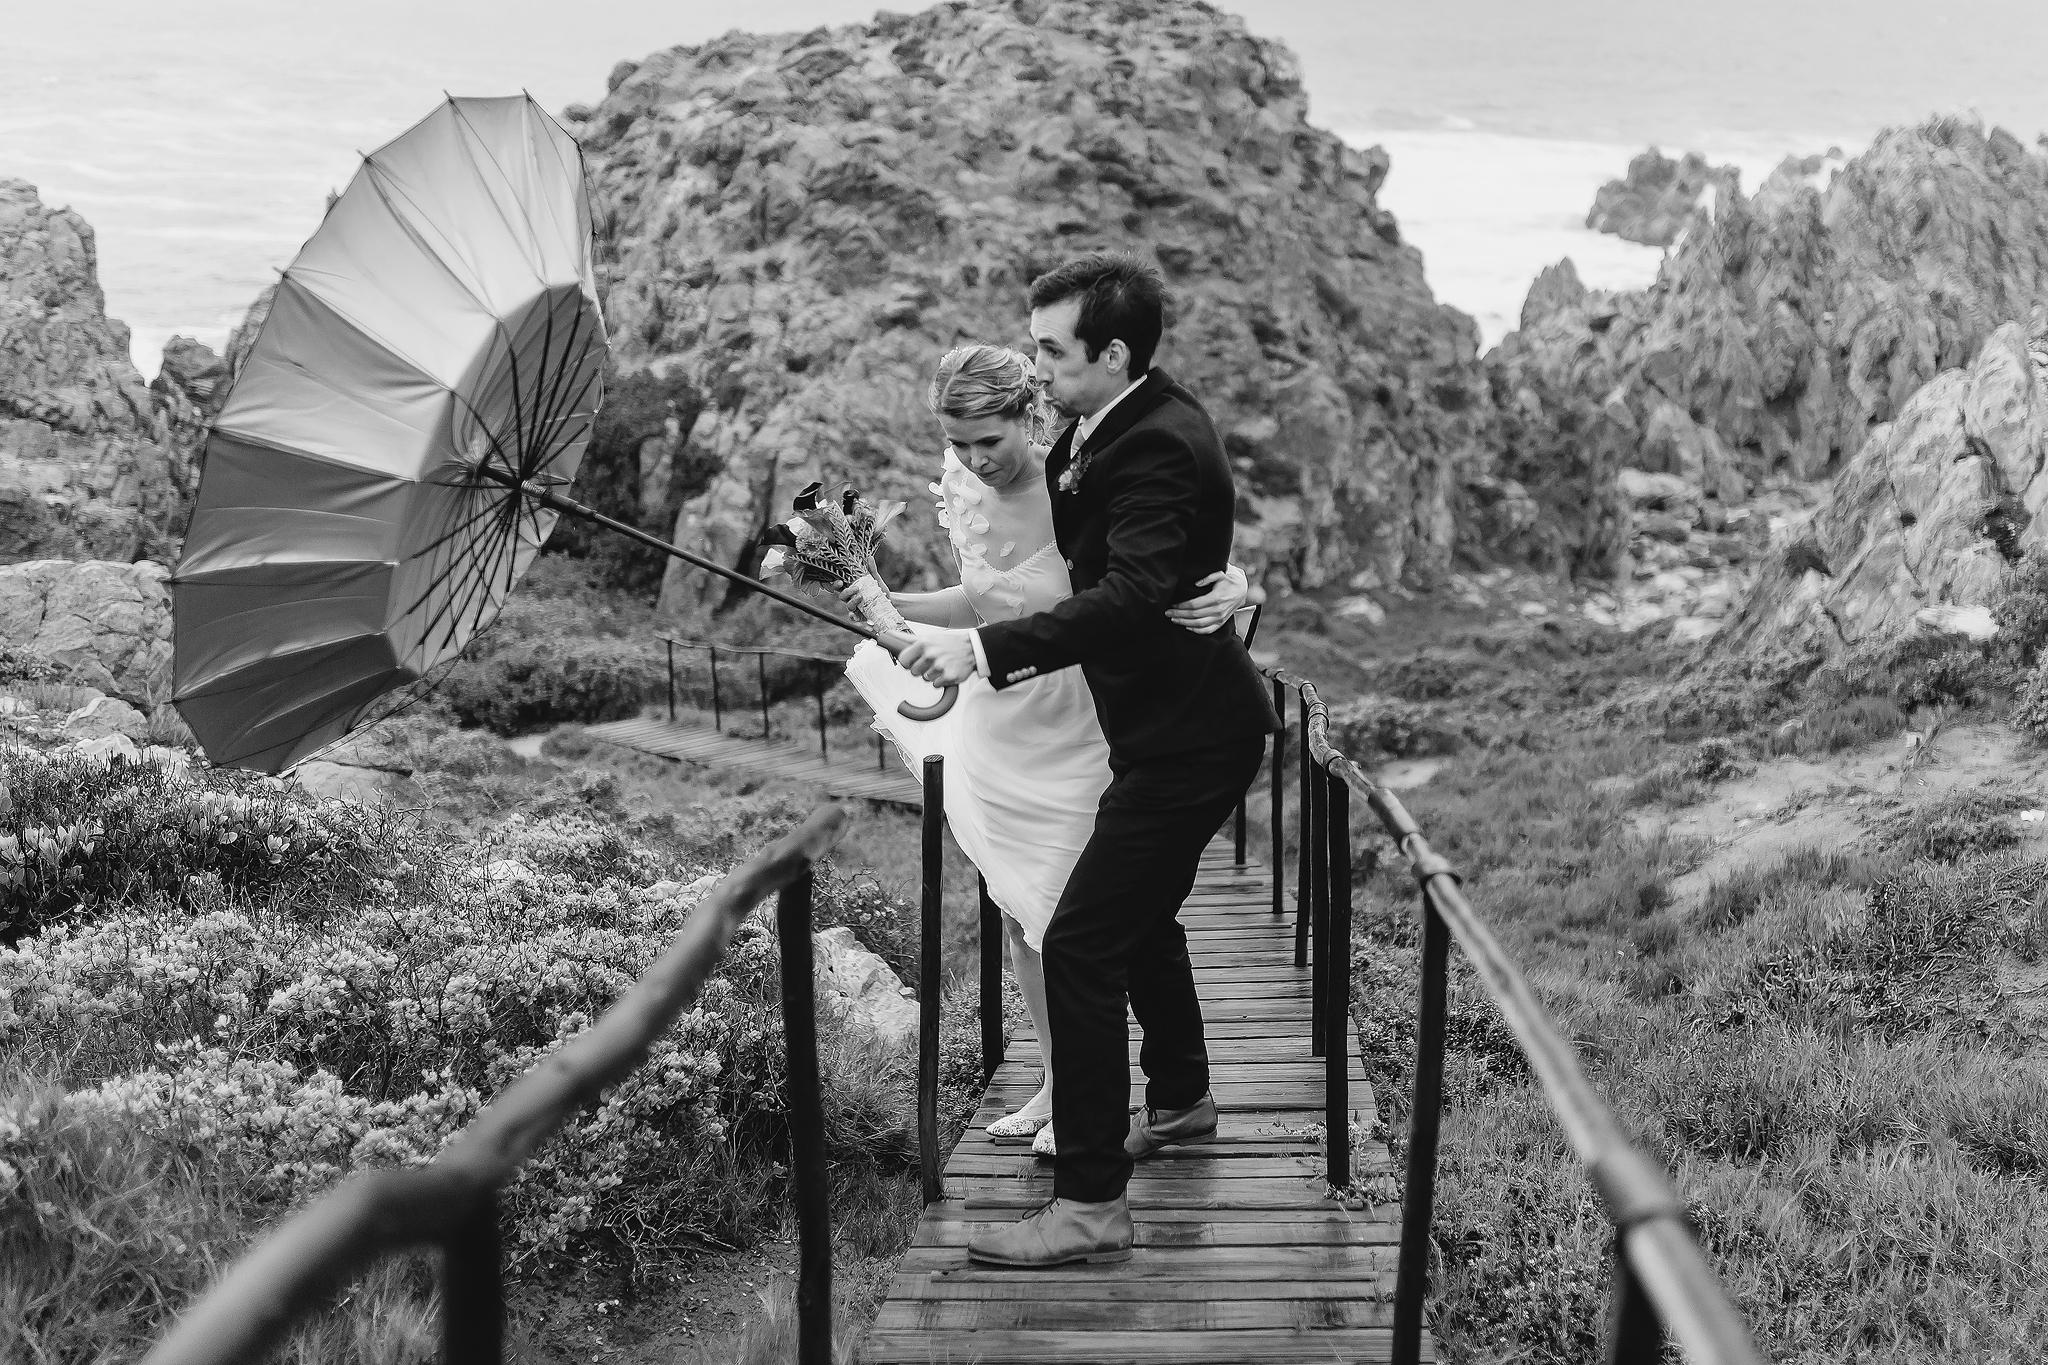 blustery-couple-boardwalk-ruan-redelinghuys-photography